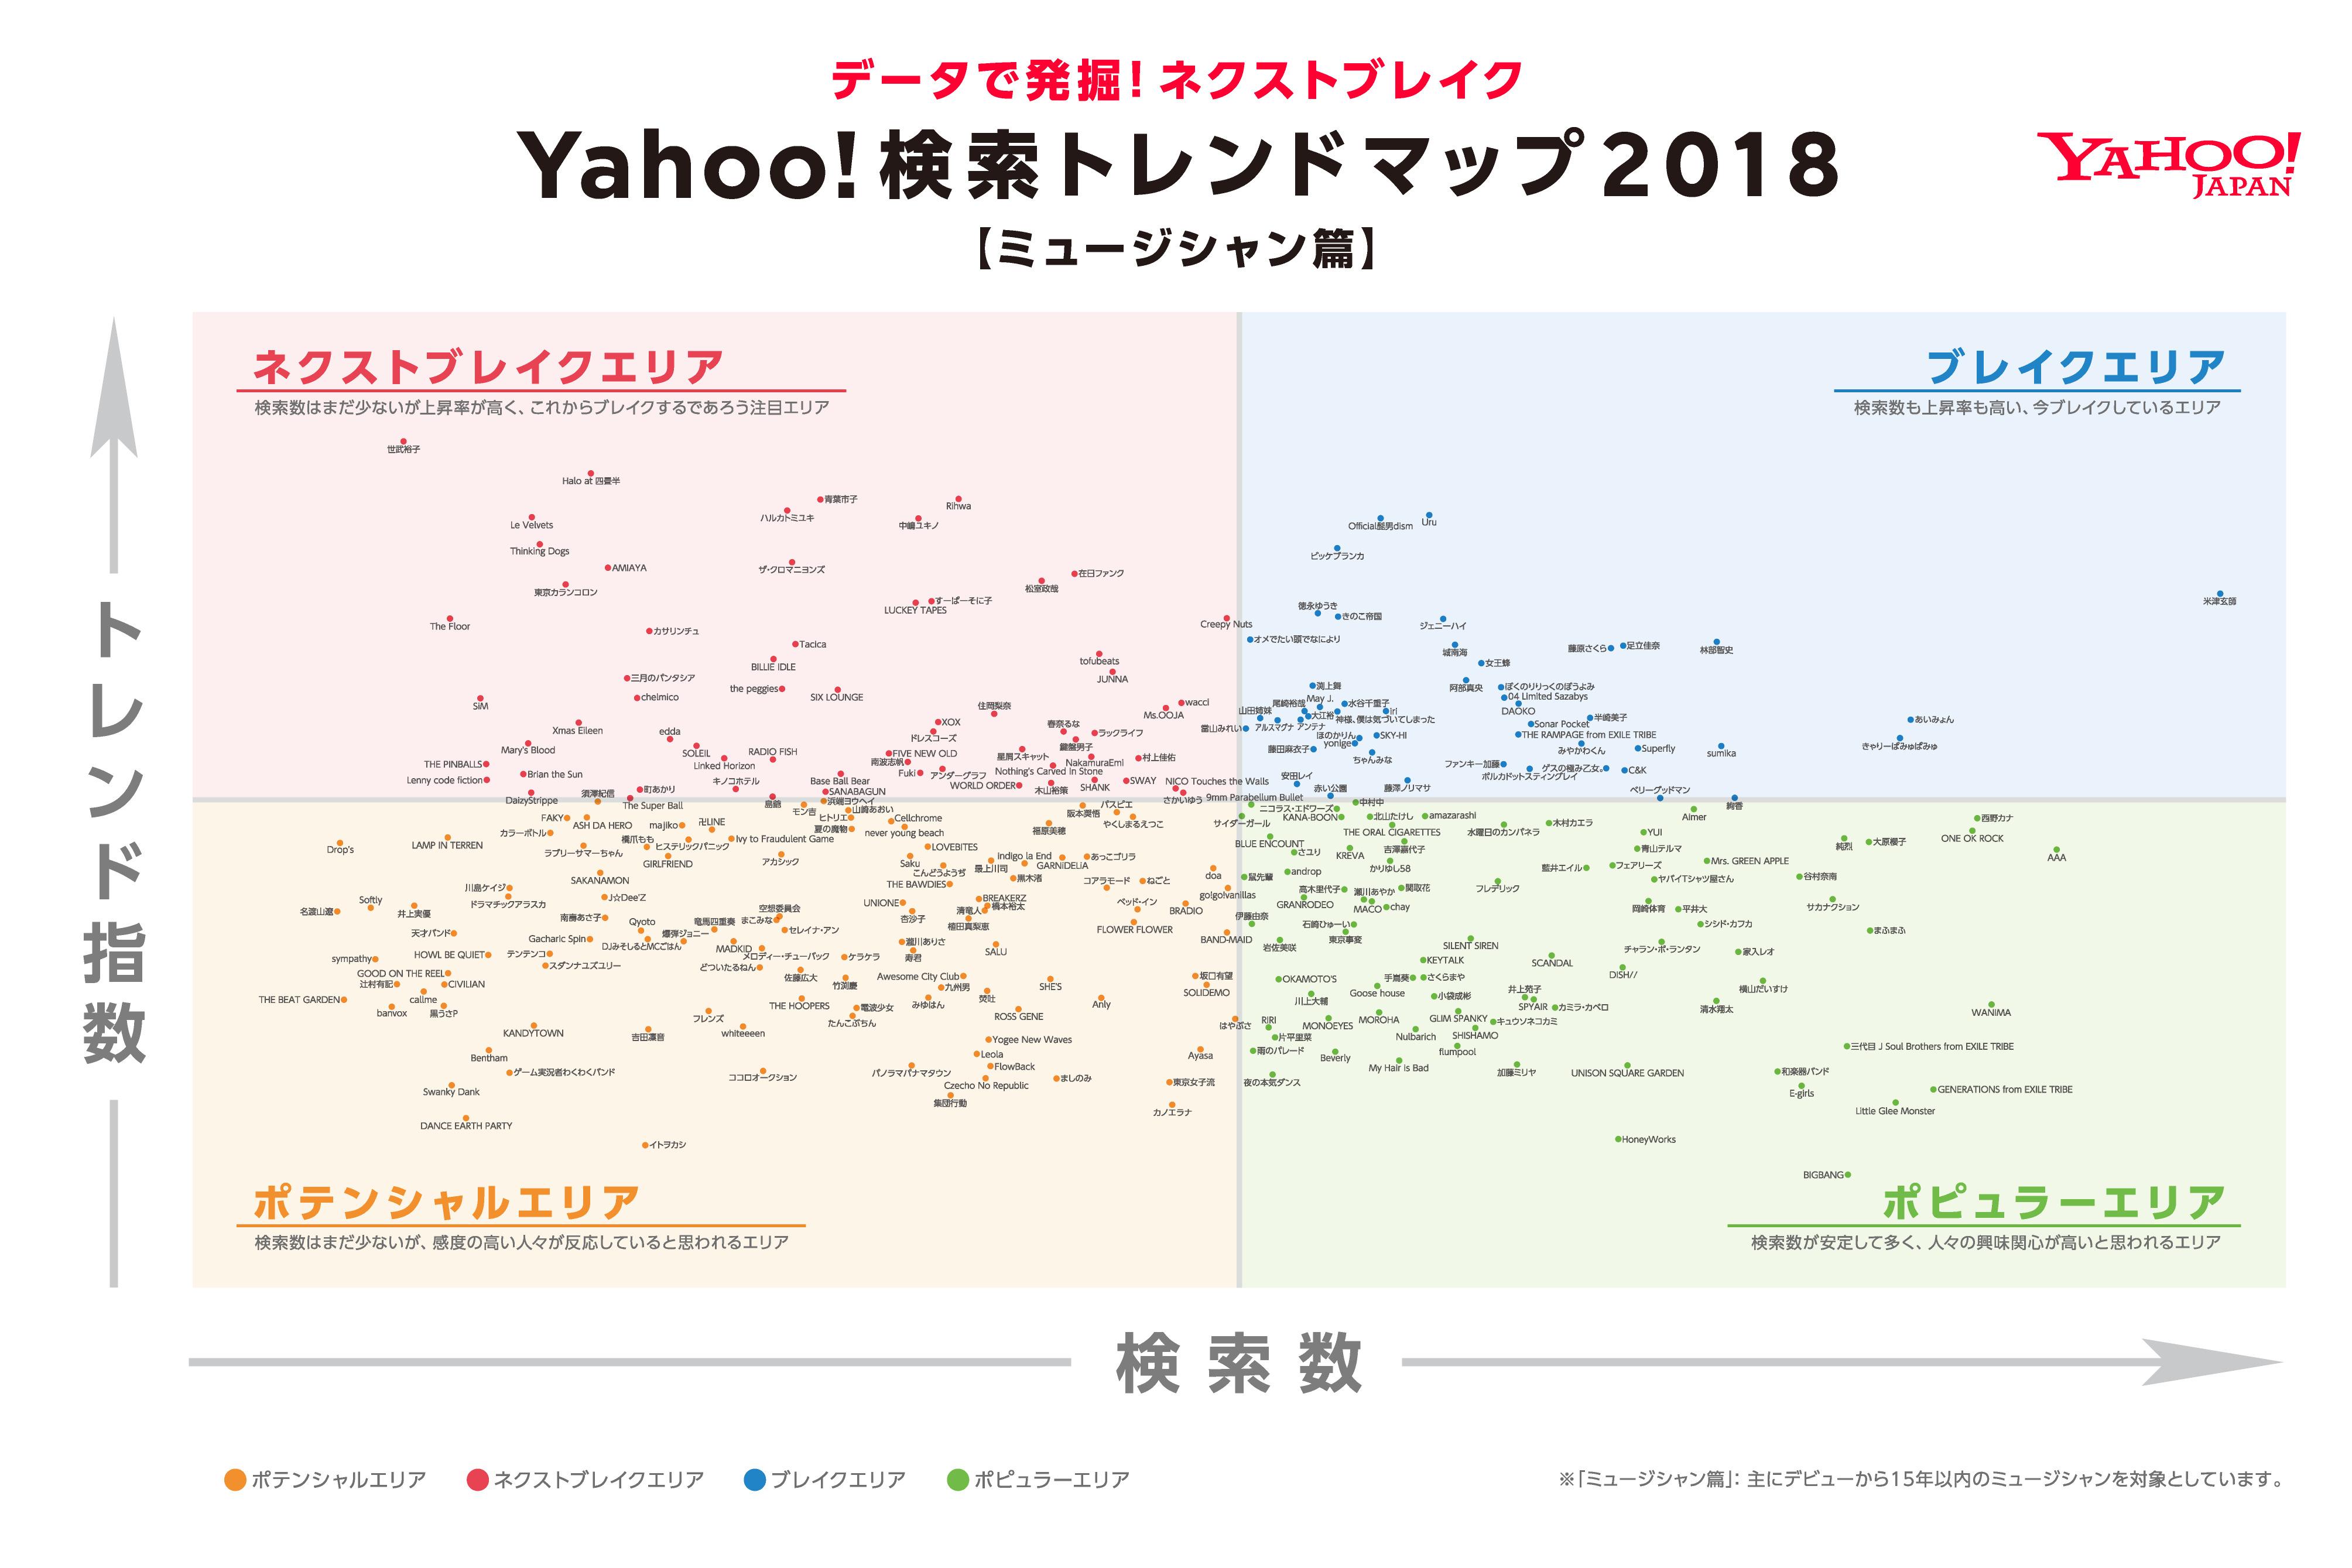 Yahoo!検索トレンドマップ2018 ミュージシャン篇